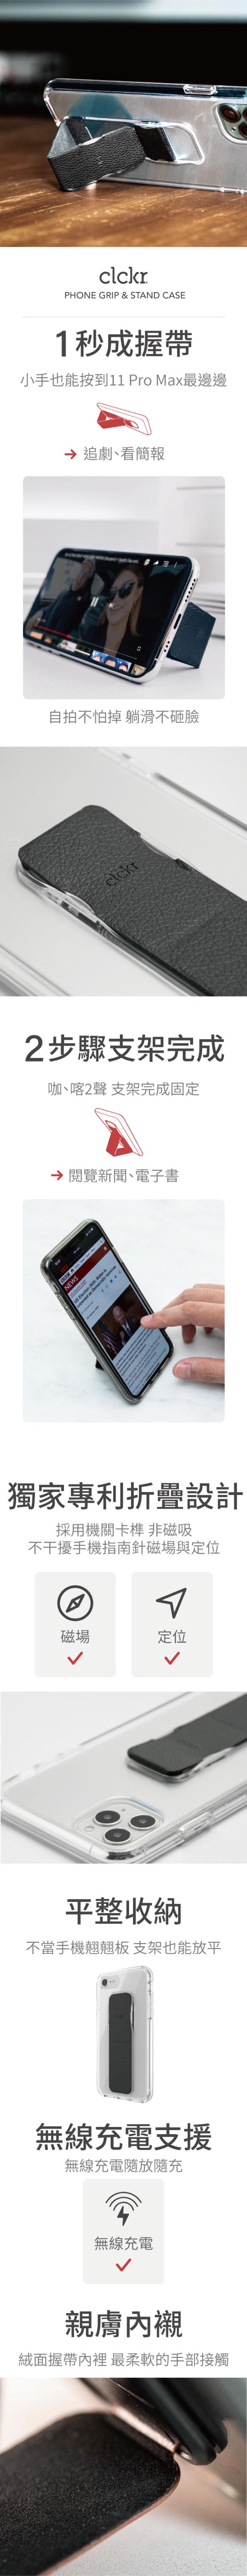 CLCKR|iPhone 11 Pro 手機殼 透明支架款